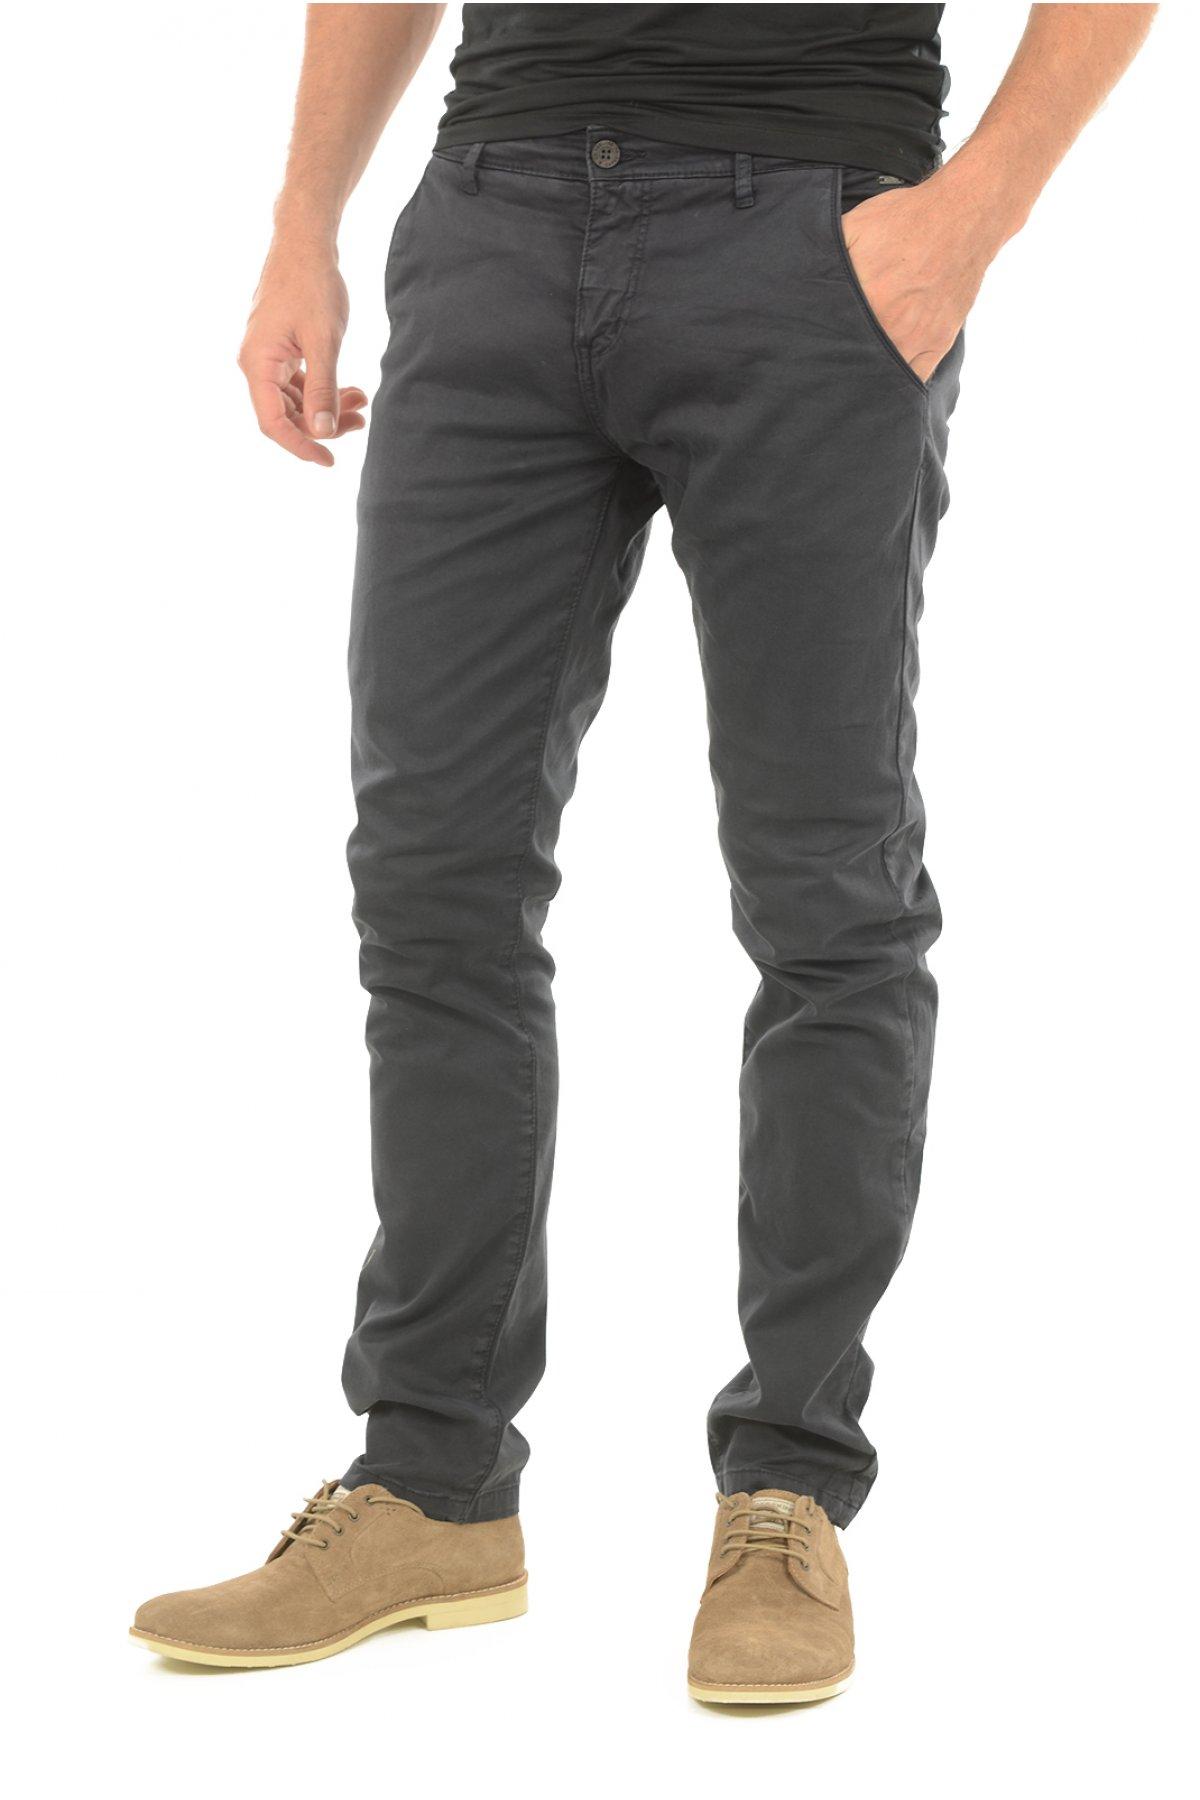 Pantalons Deeluxe Homme 28,29,30,31,32,33,36